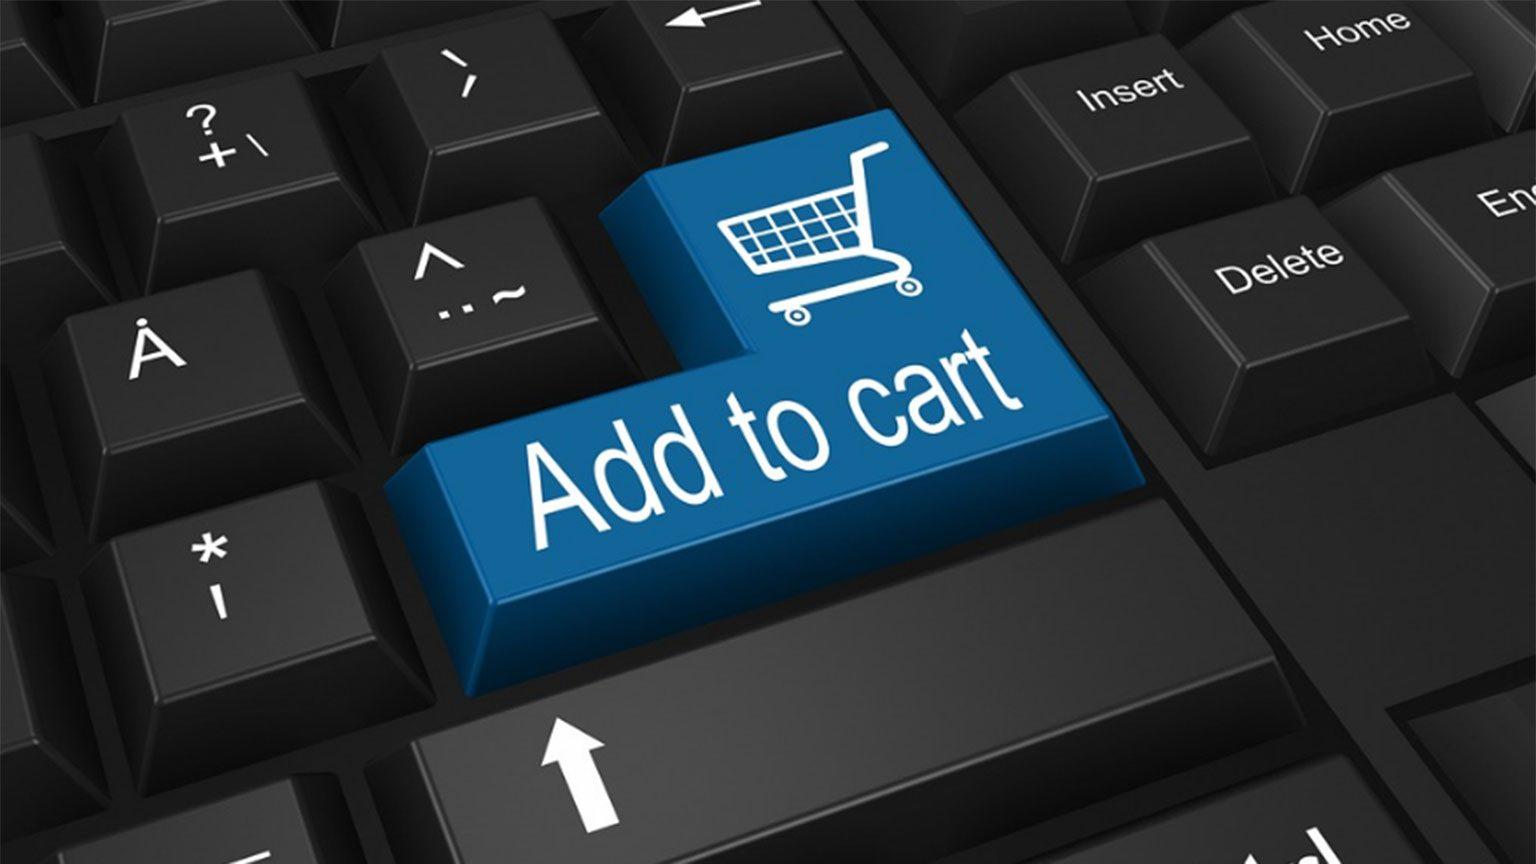 Add to cart keyboard